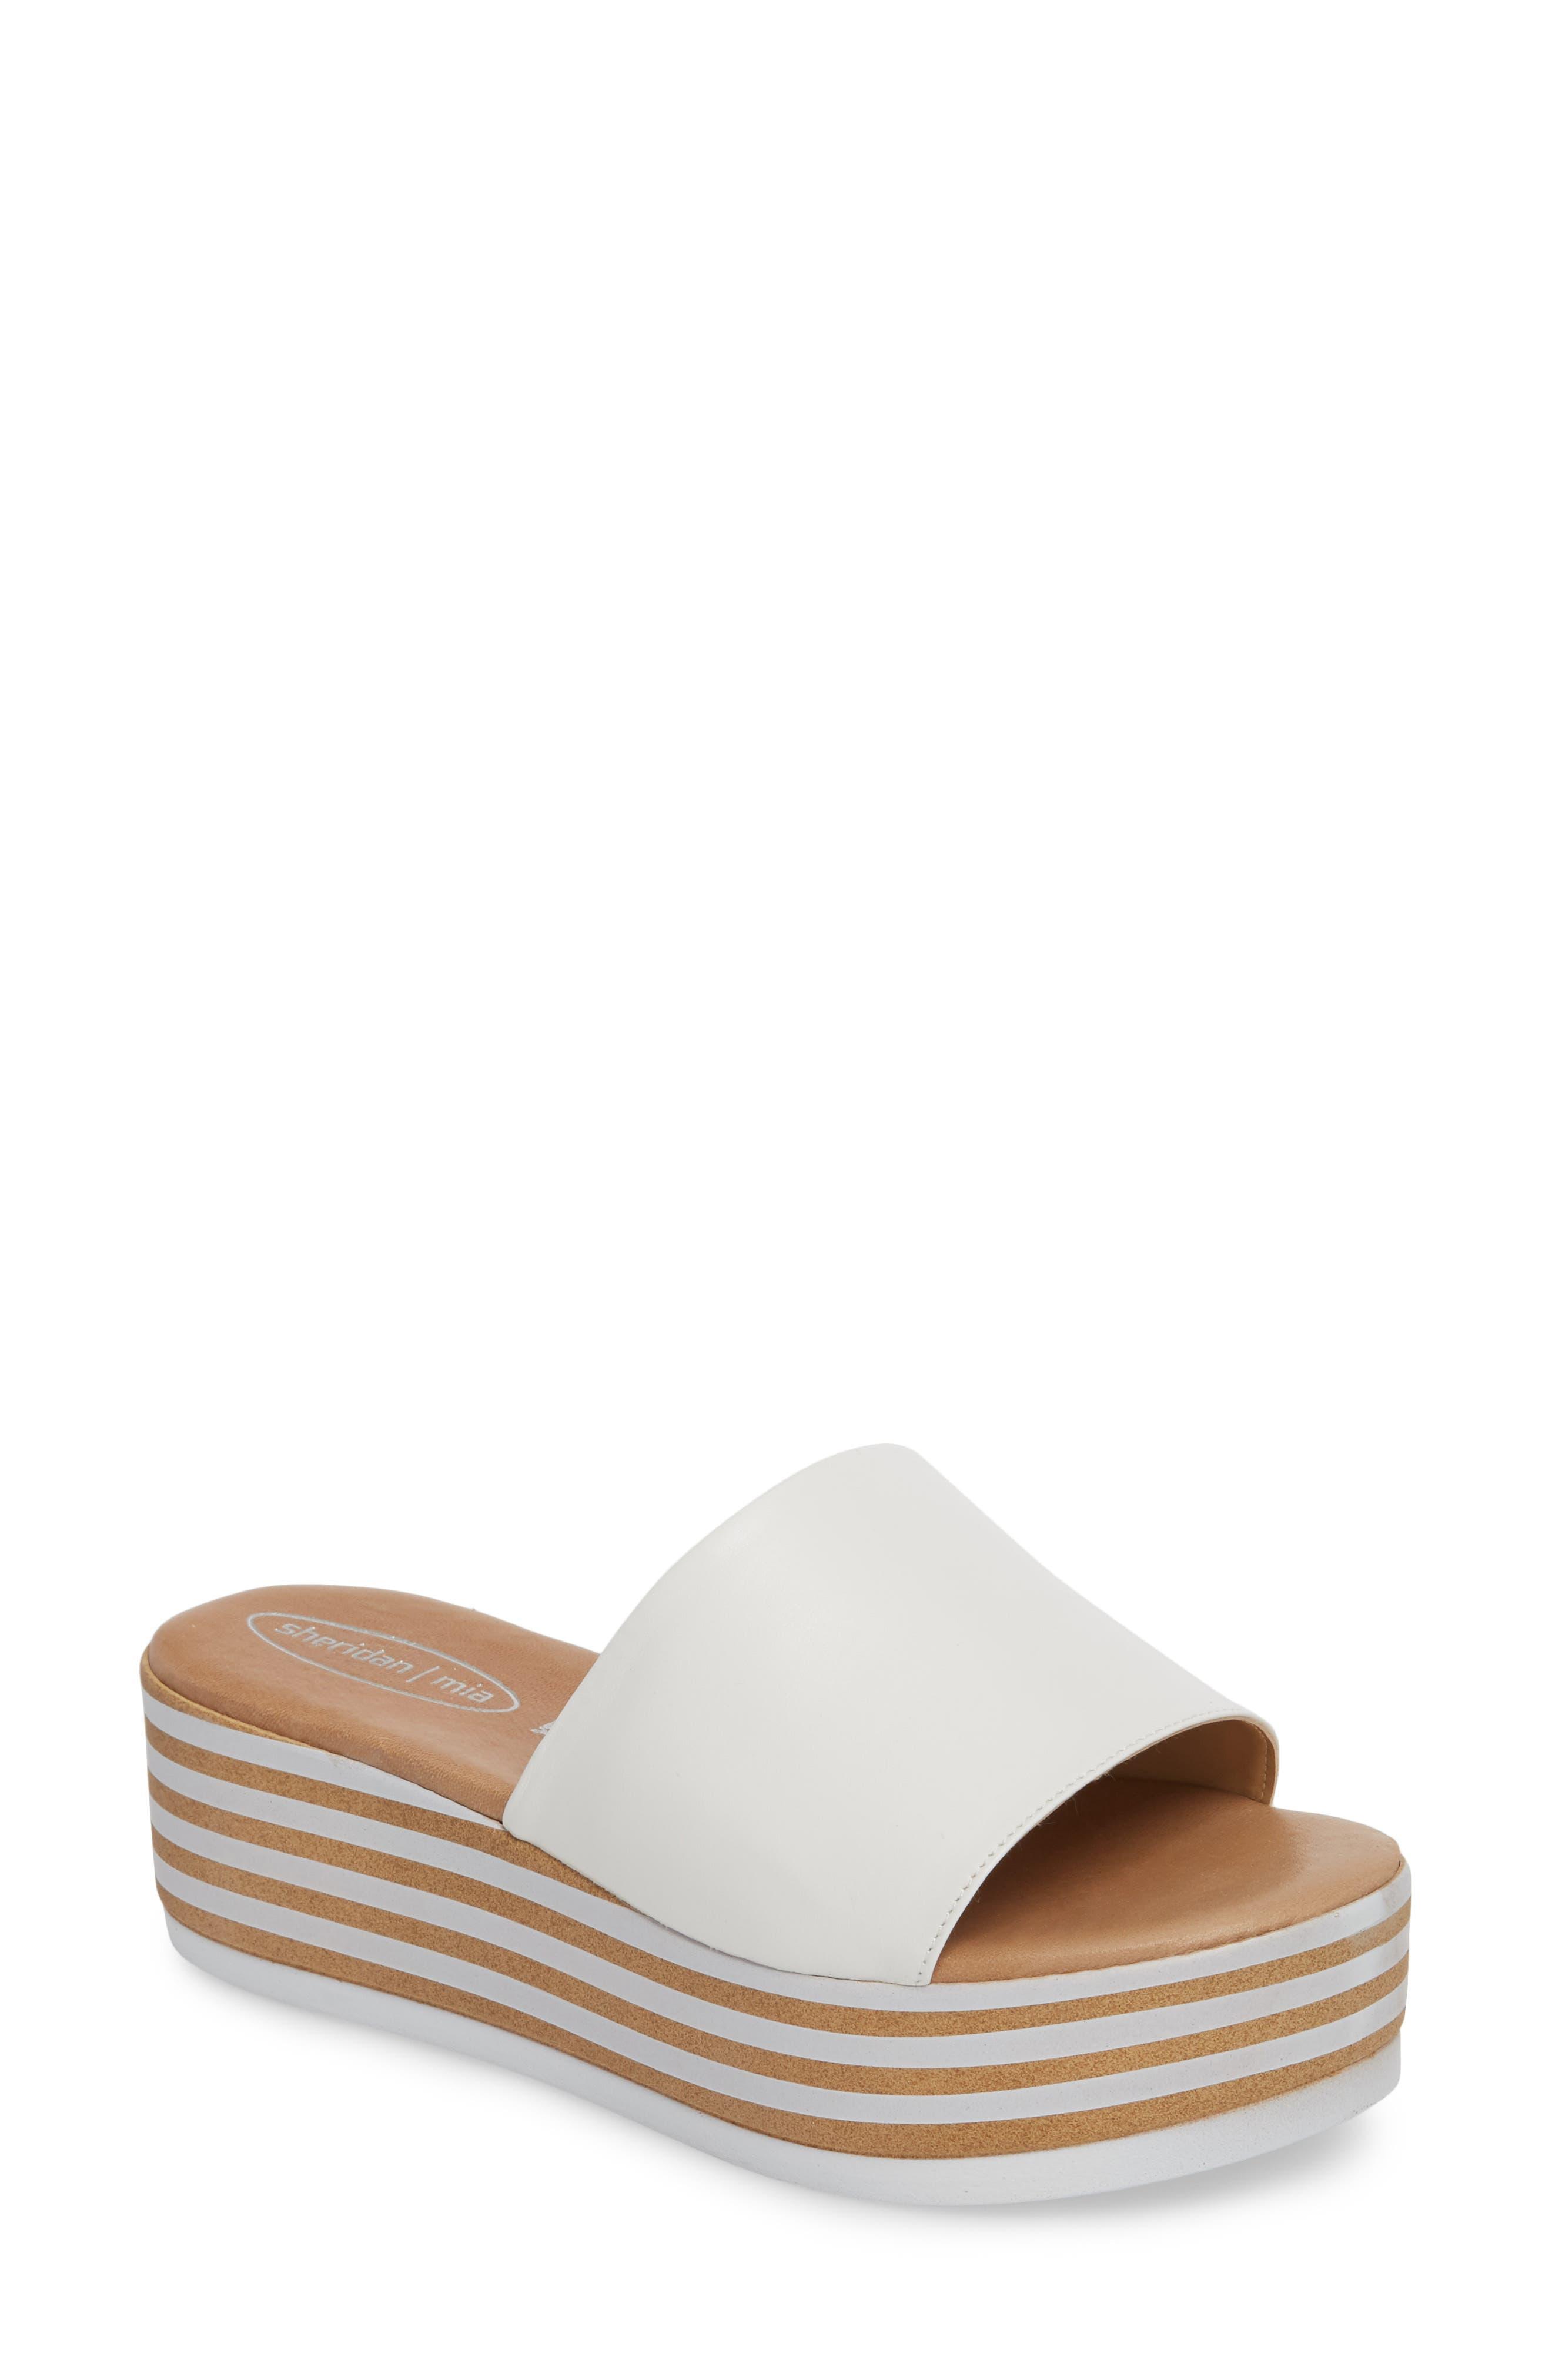 Sheridan Mia Reesa Platform Slide Sandal White